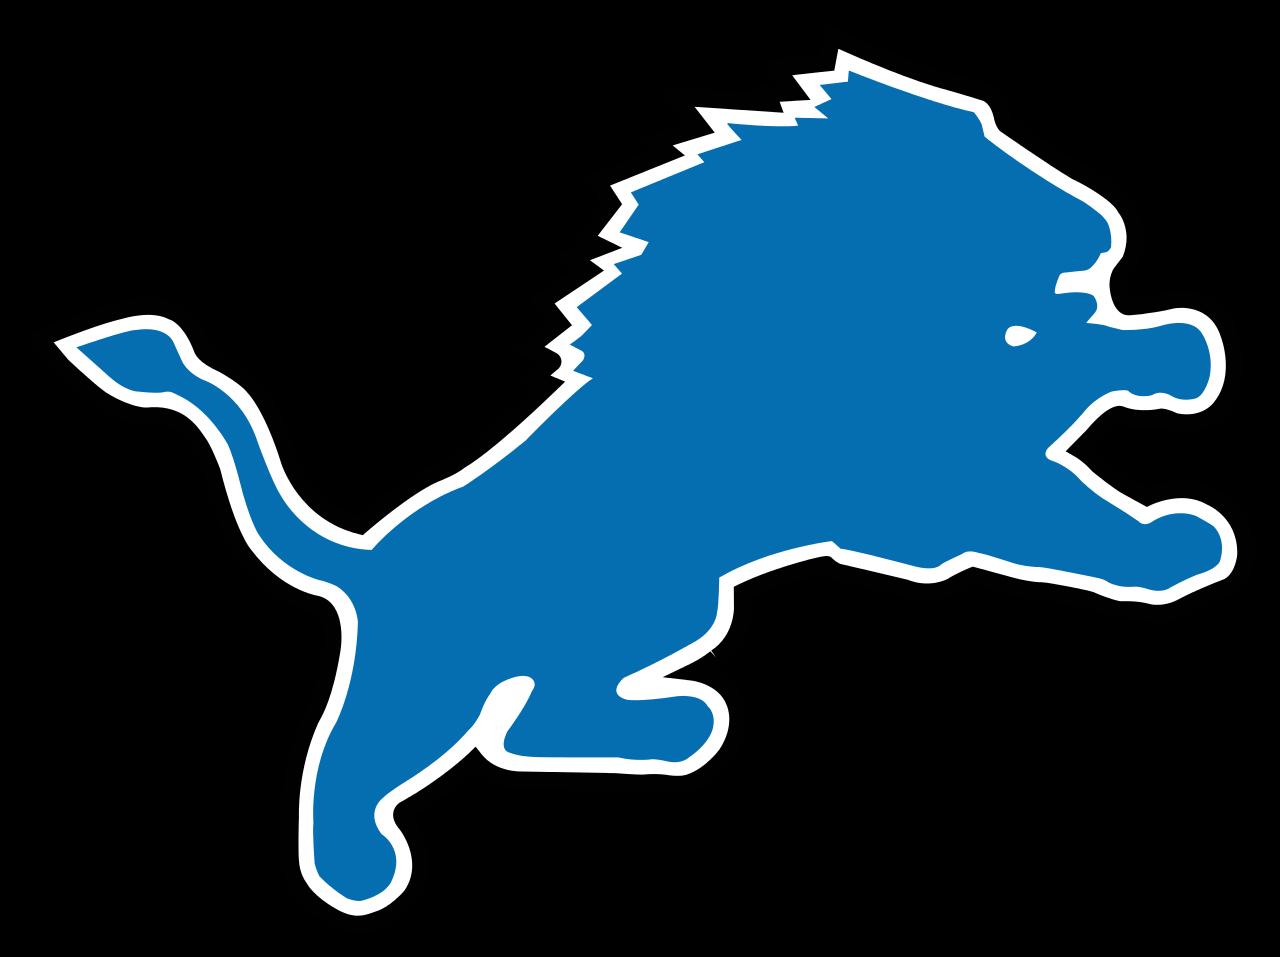 Detroit lions old Logos.